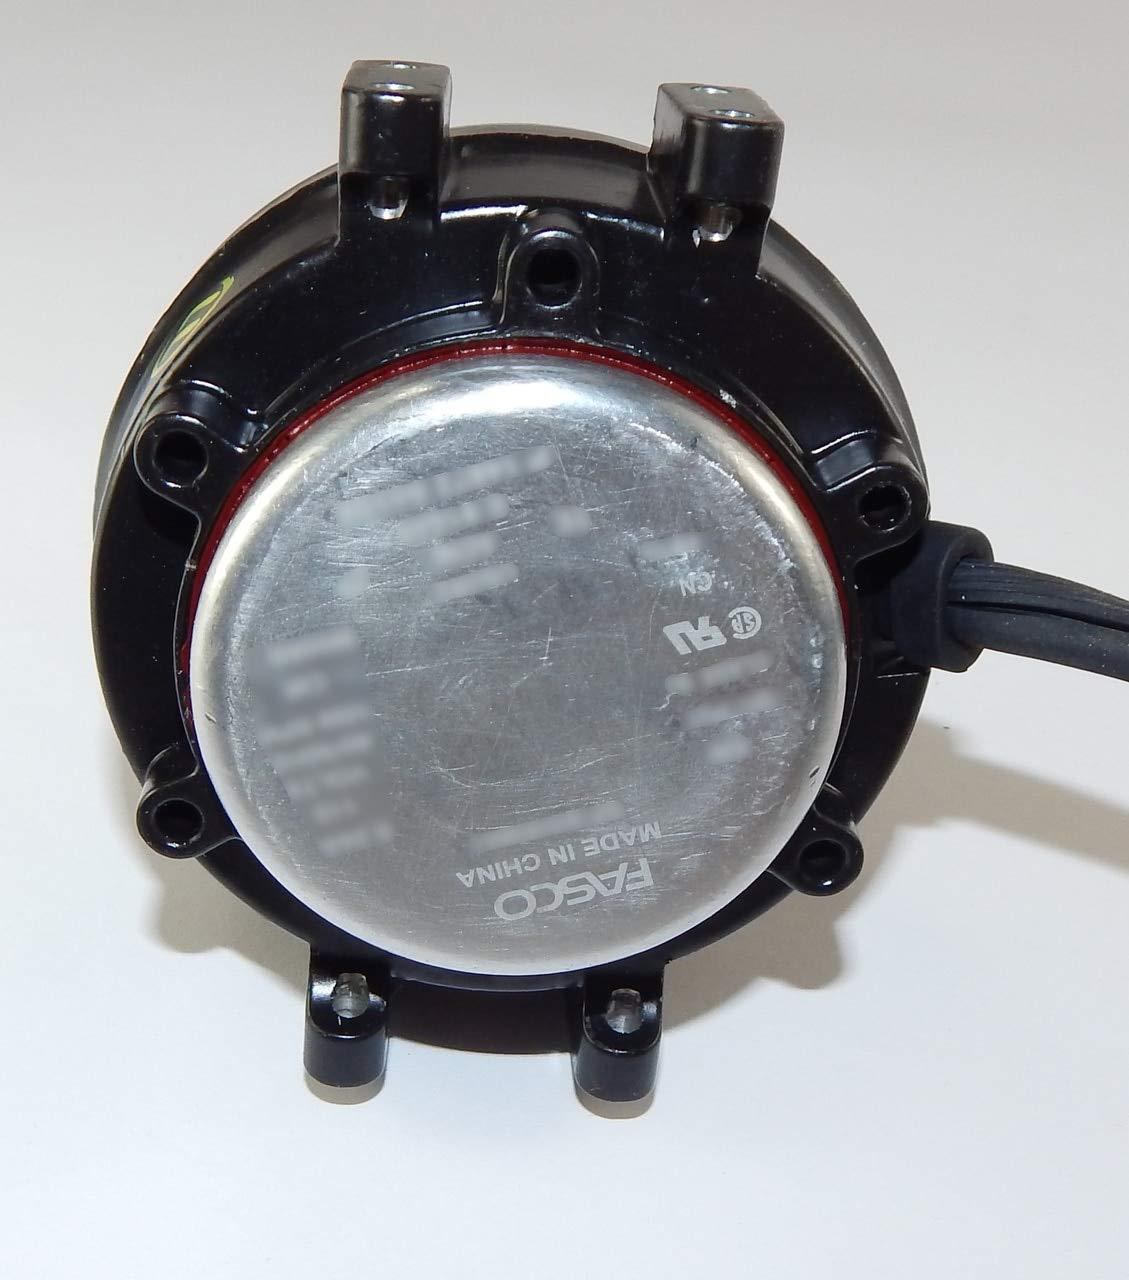 9 Watt 1550 RPM CWLE 230V Unit Bearing Refrigeration Fasco Electric Motor # UB564